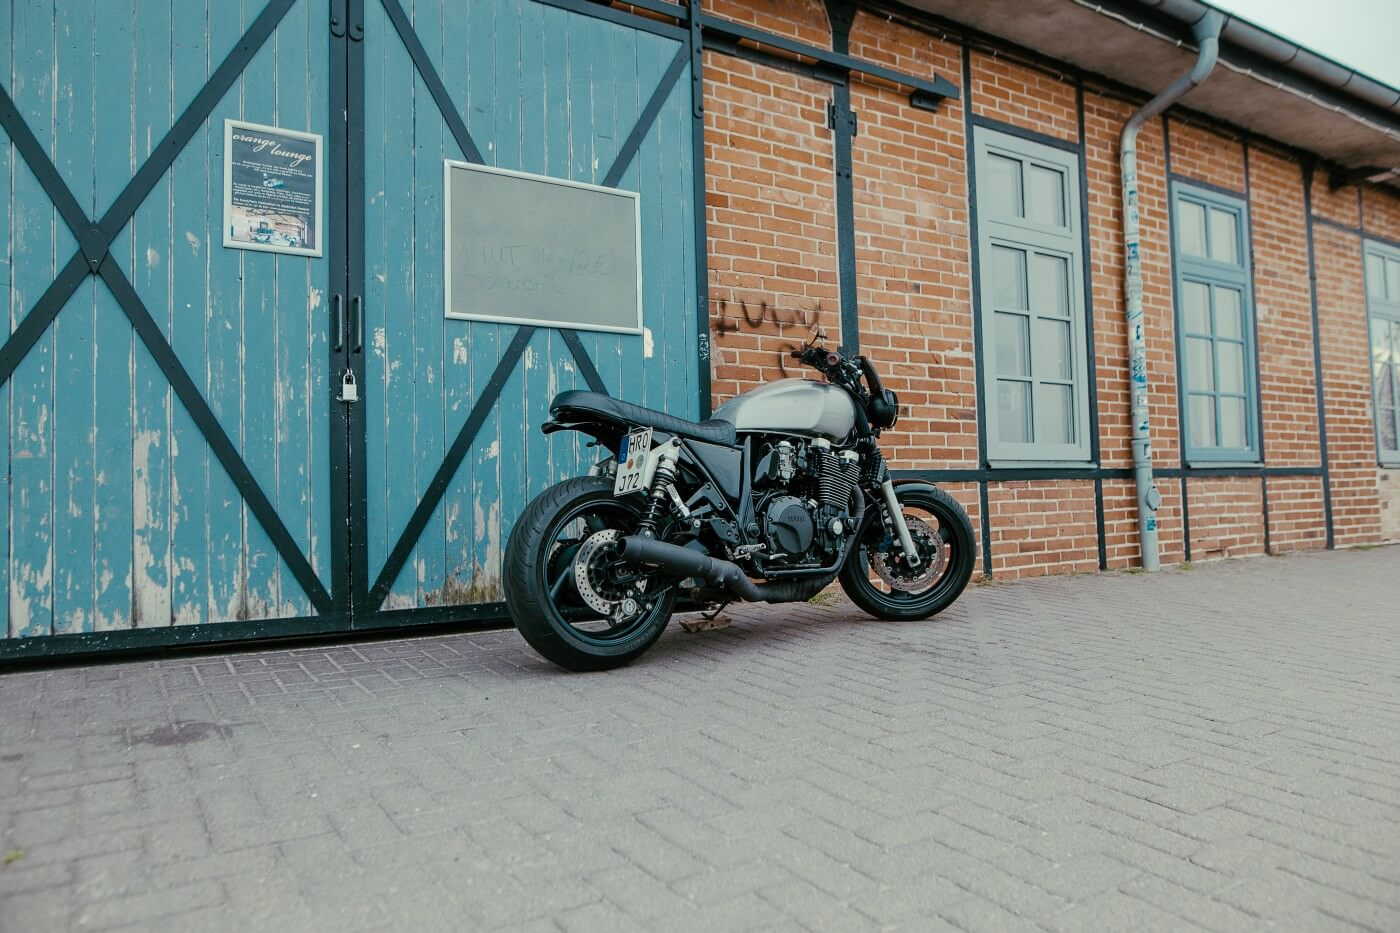 xjr-1300-caferace-bratr-street-flat-track-099